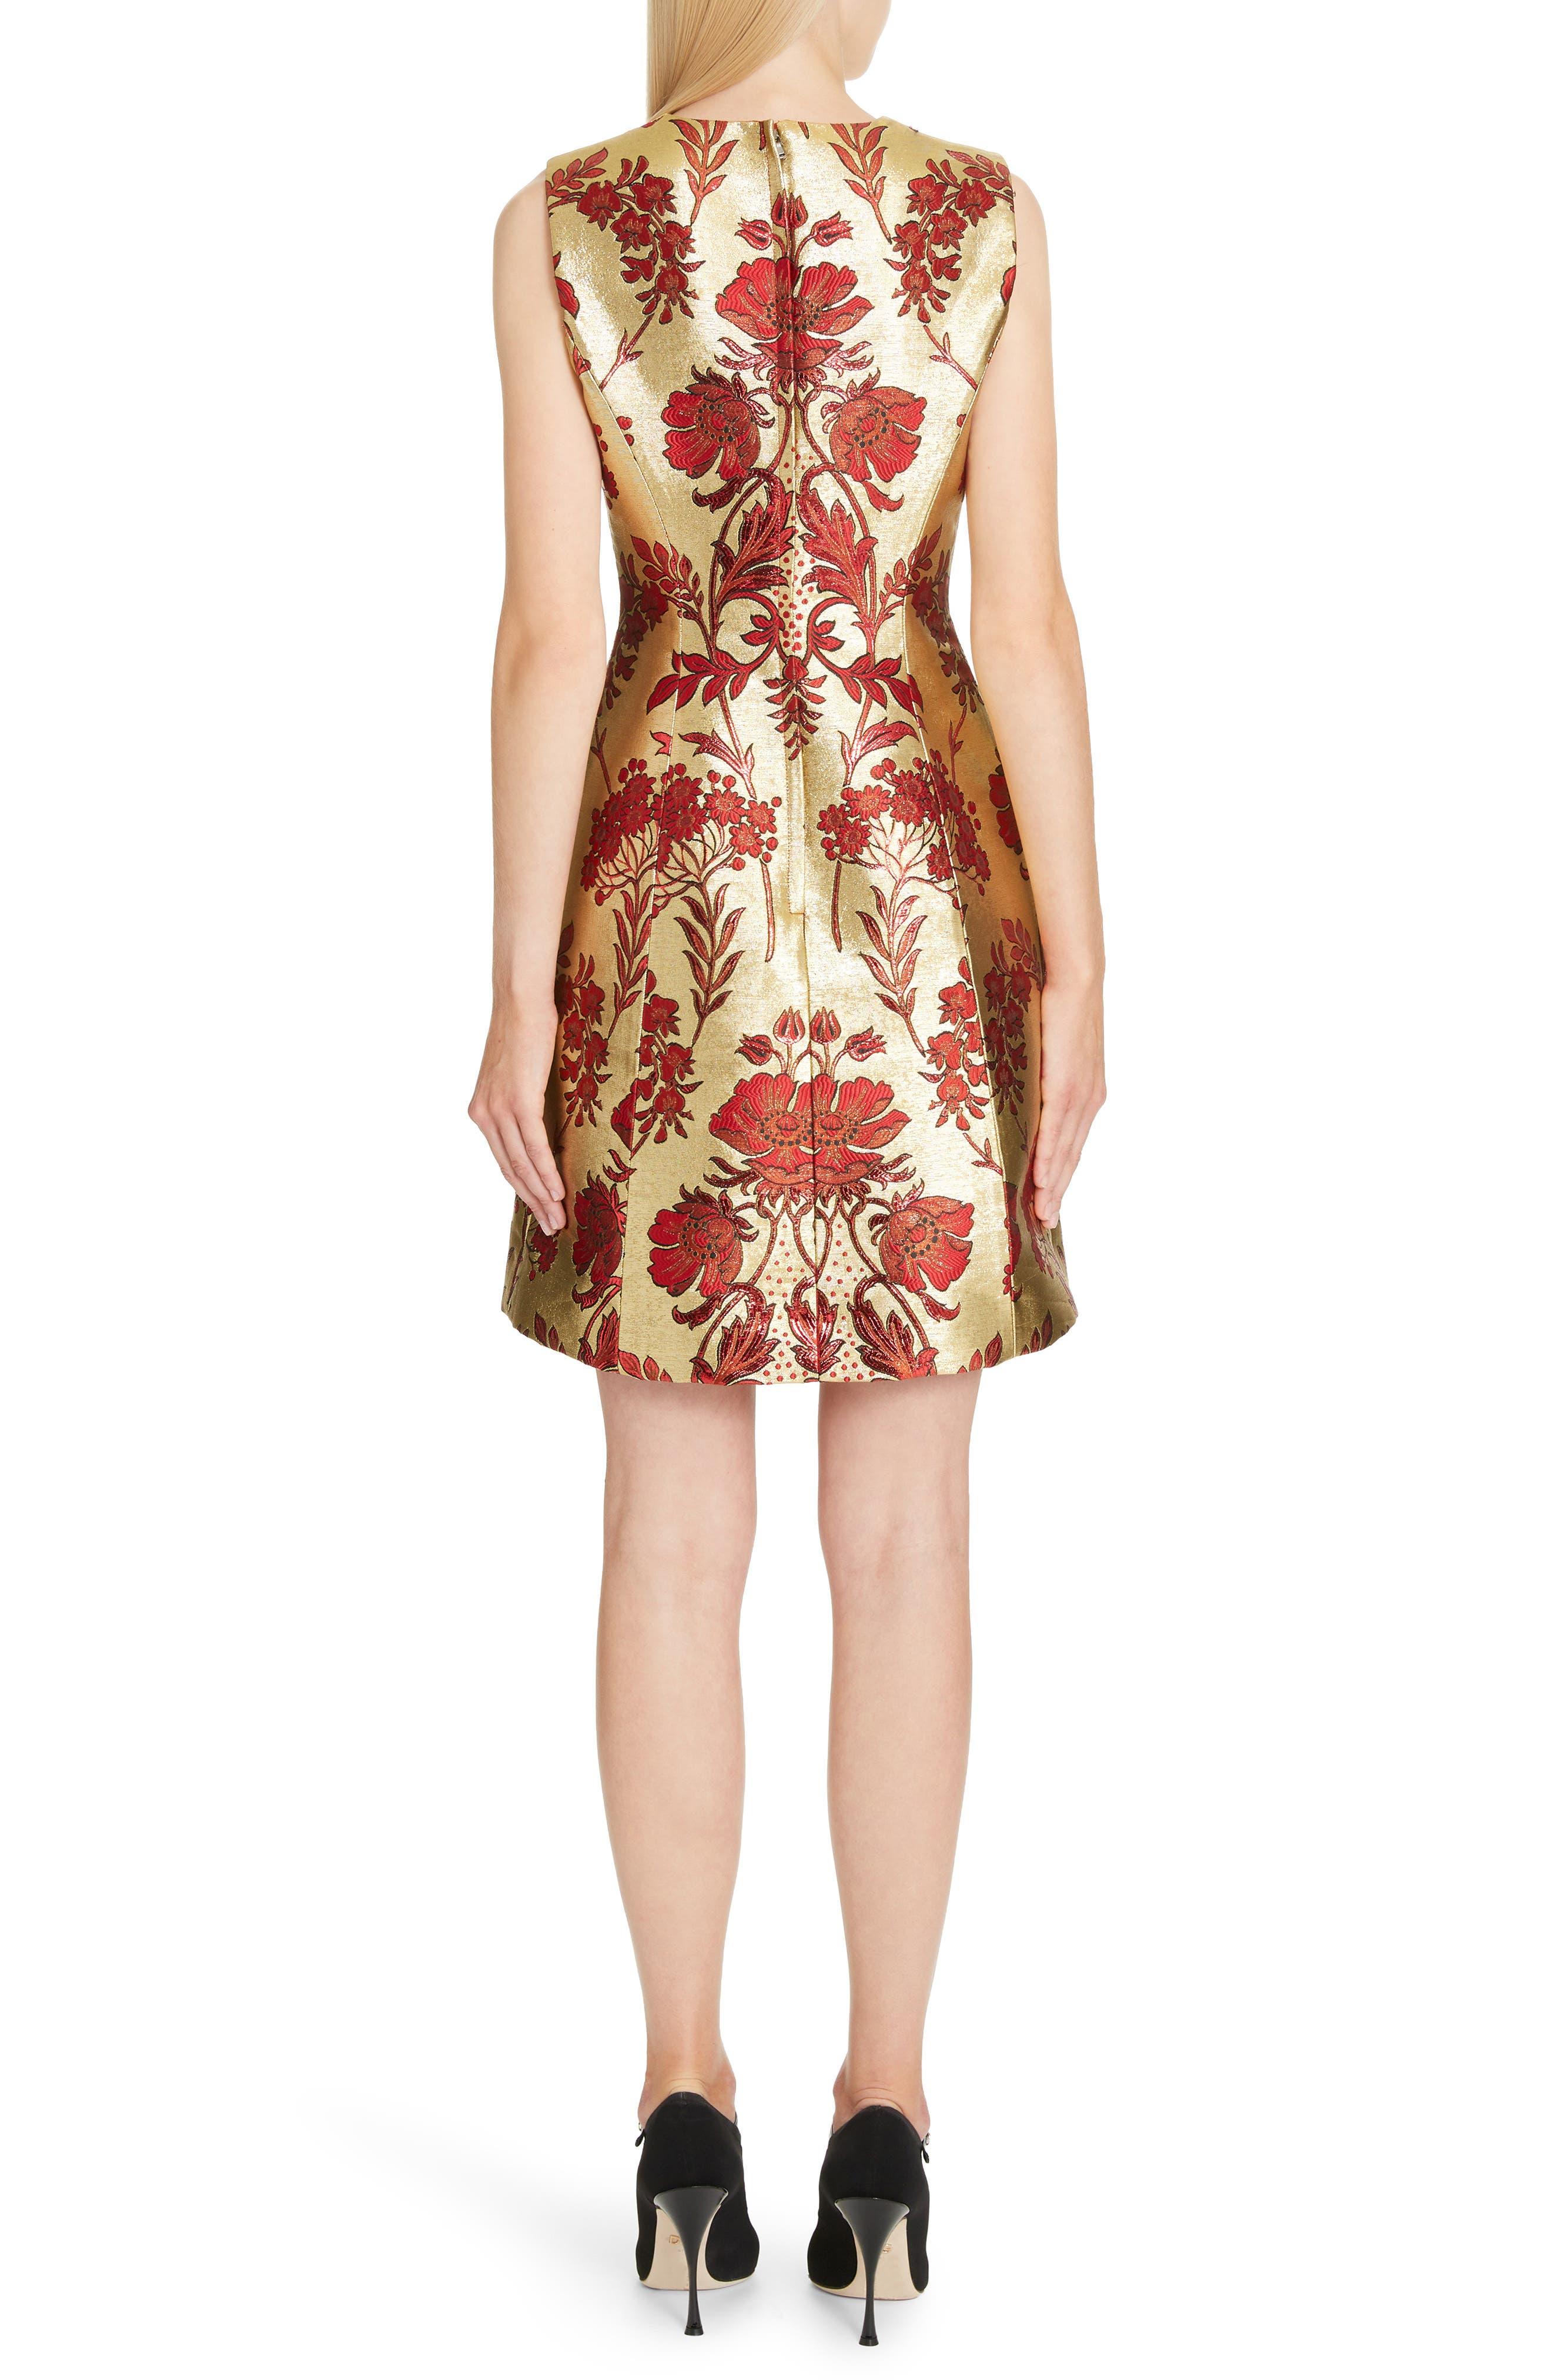 Metallic Jacquard A-Line Dress,                             Alternate thumbnail 2, color,                             S8351 JACQUARD LUREX FLORAL